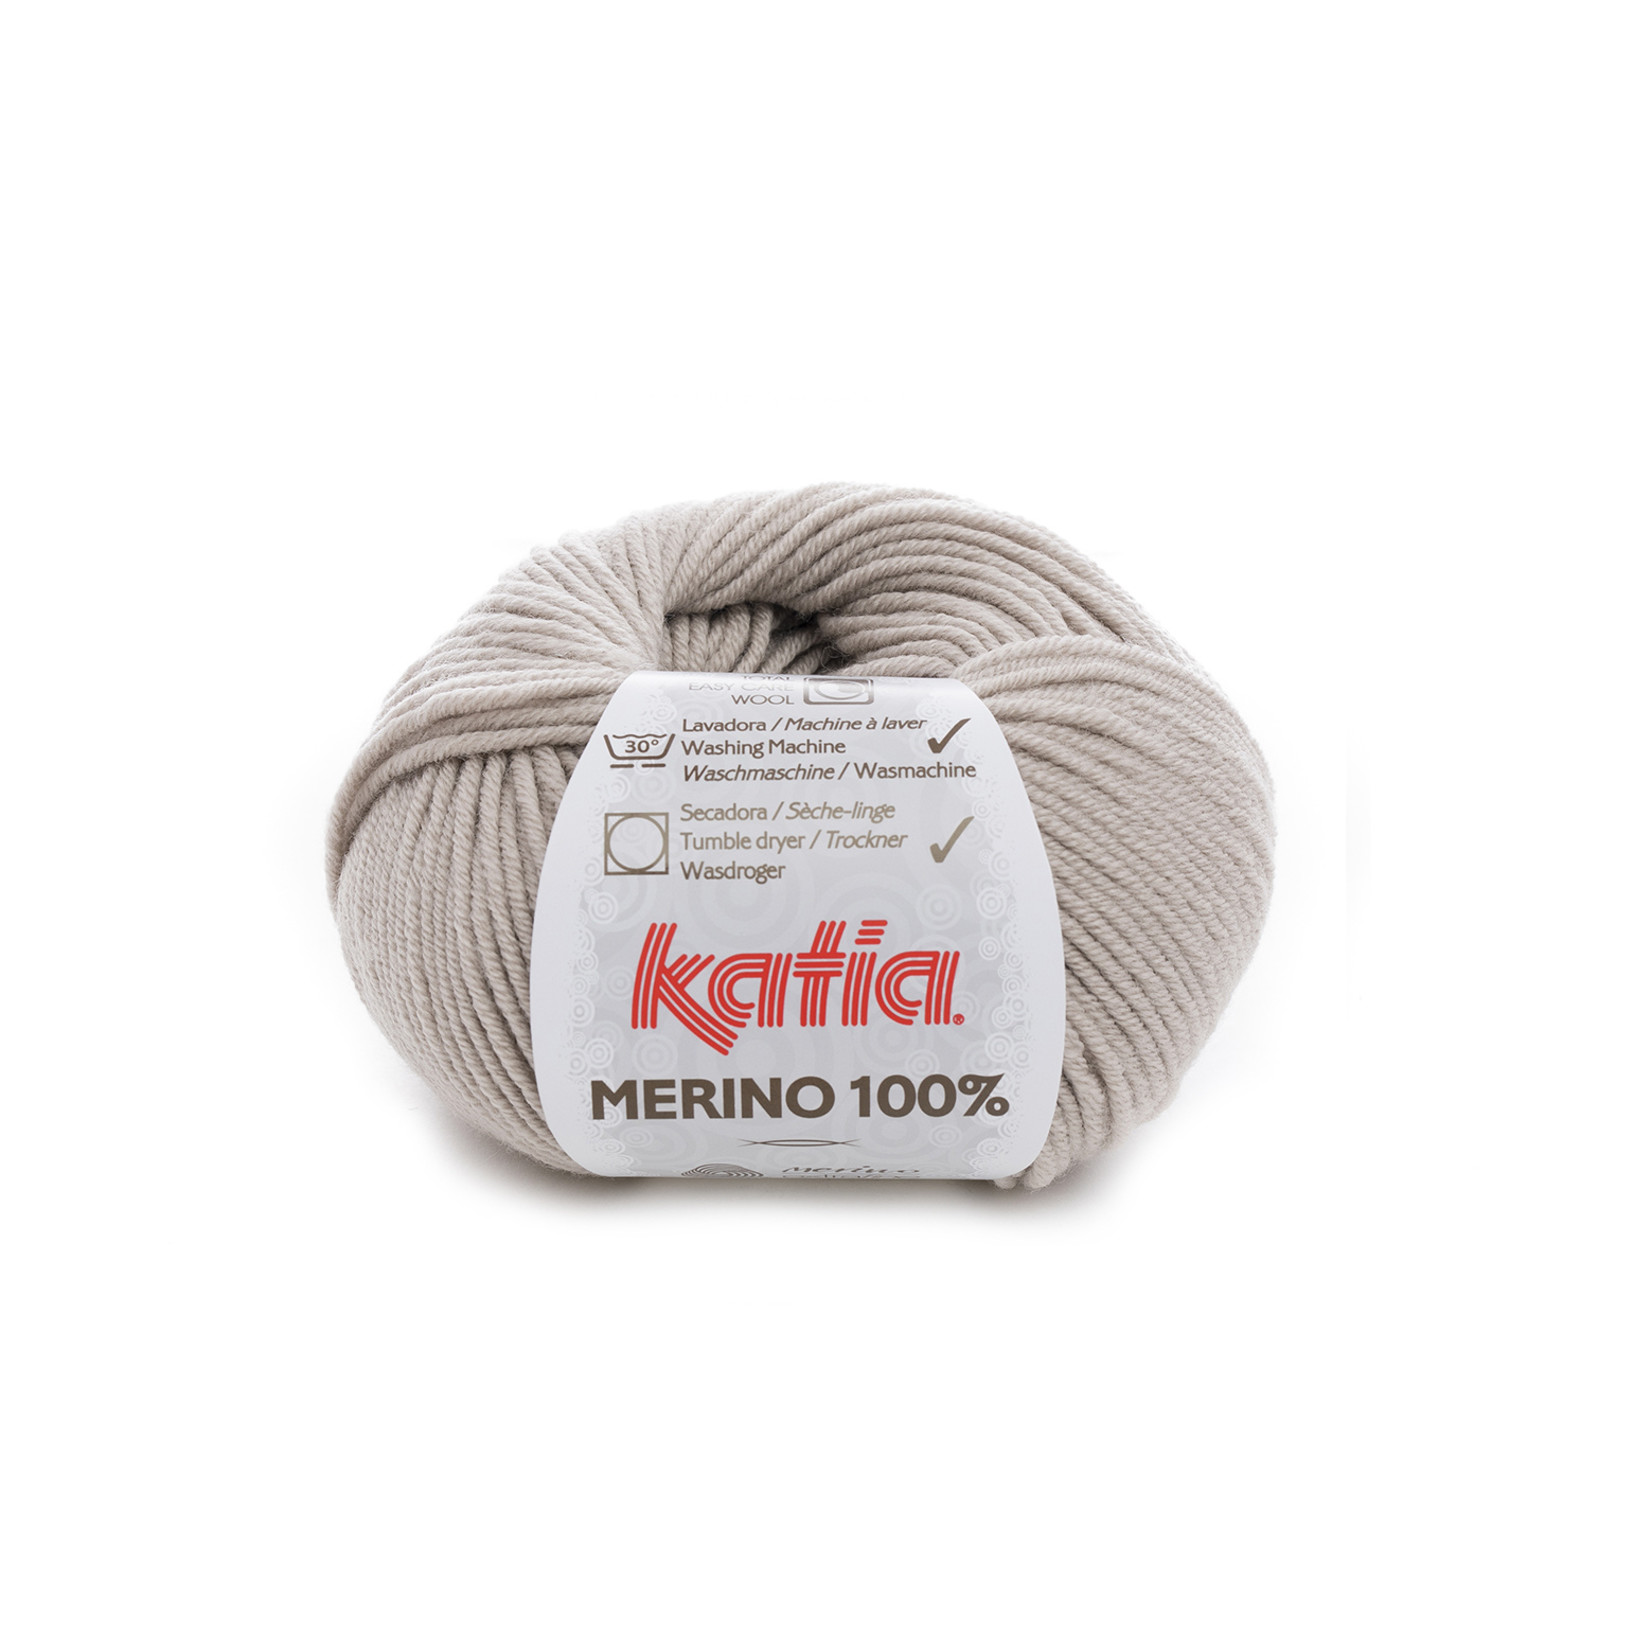 Katia Katia Merino 100% - 40 - Steengrijs_ - 50 gr. = 102 m.